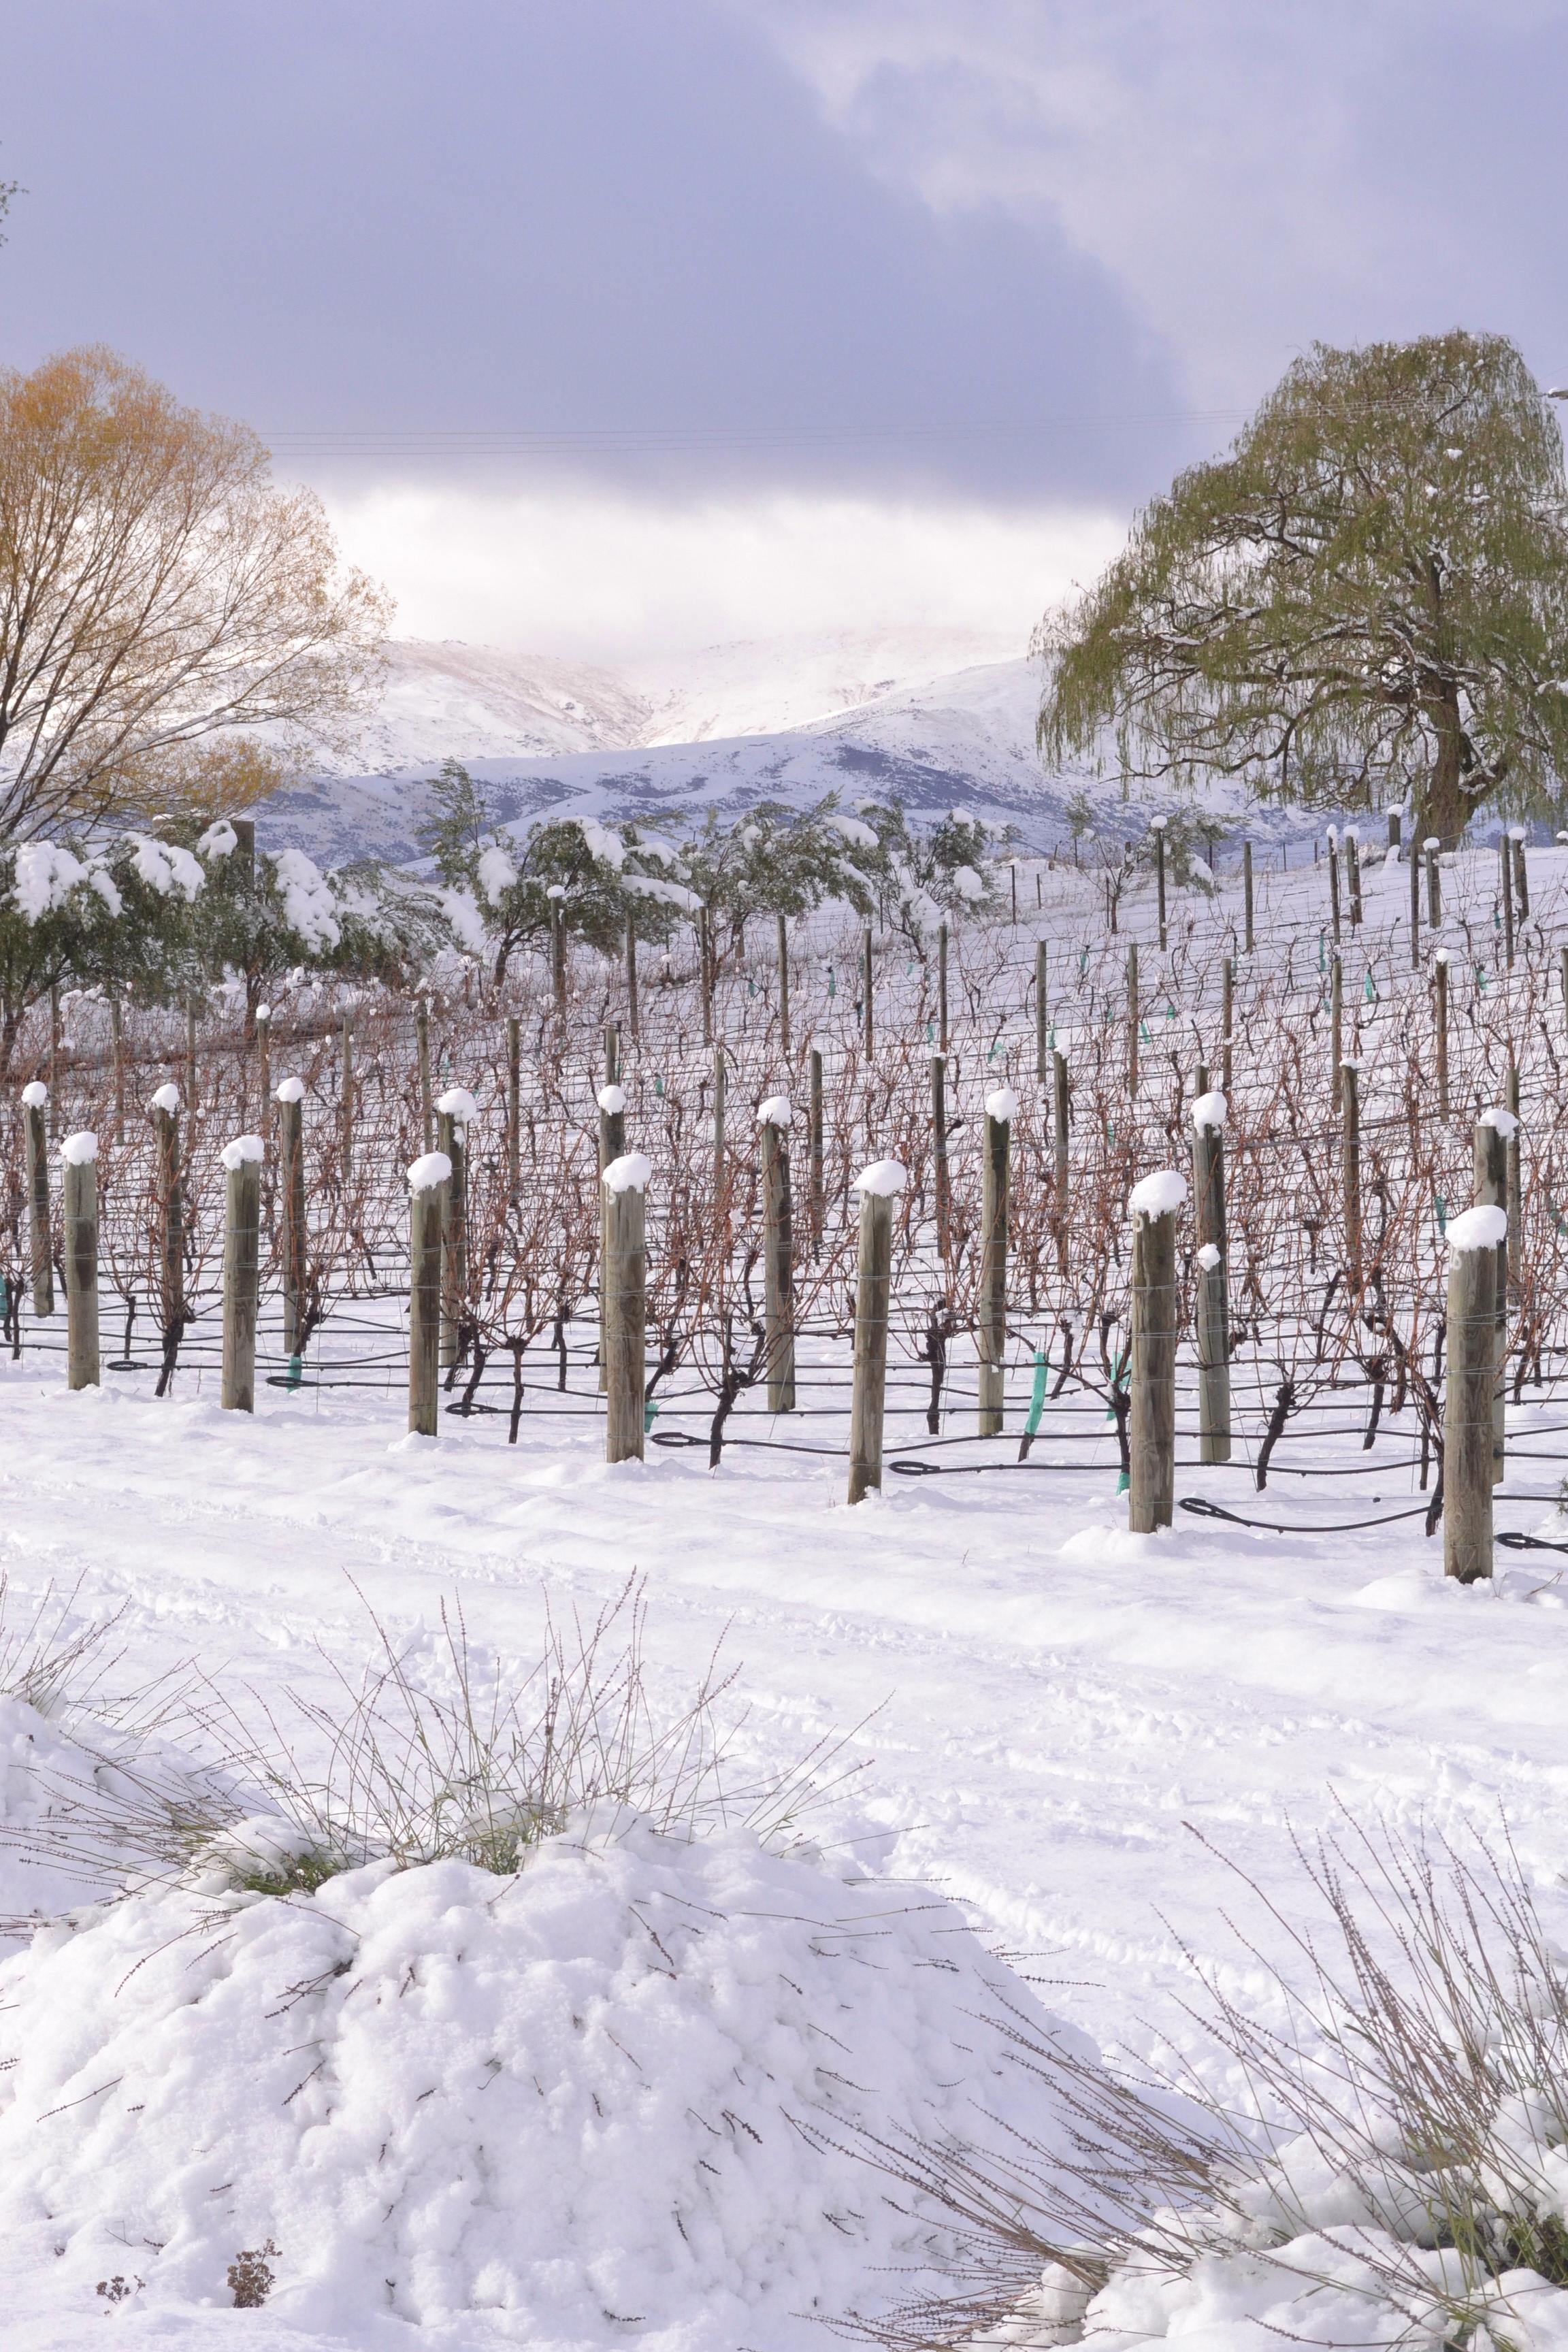 winter:house:vineyard vol. 2.png